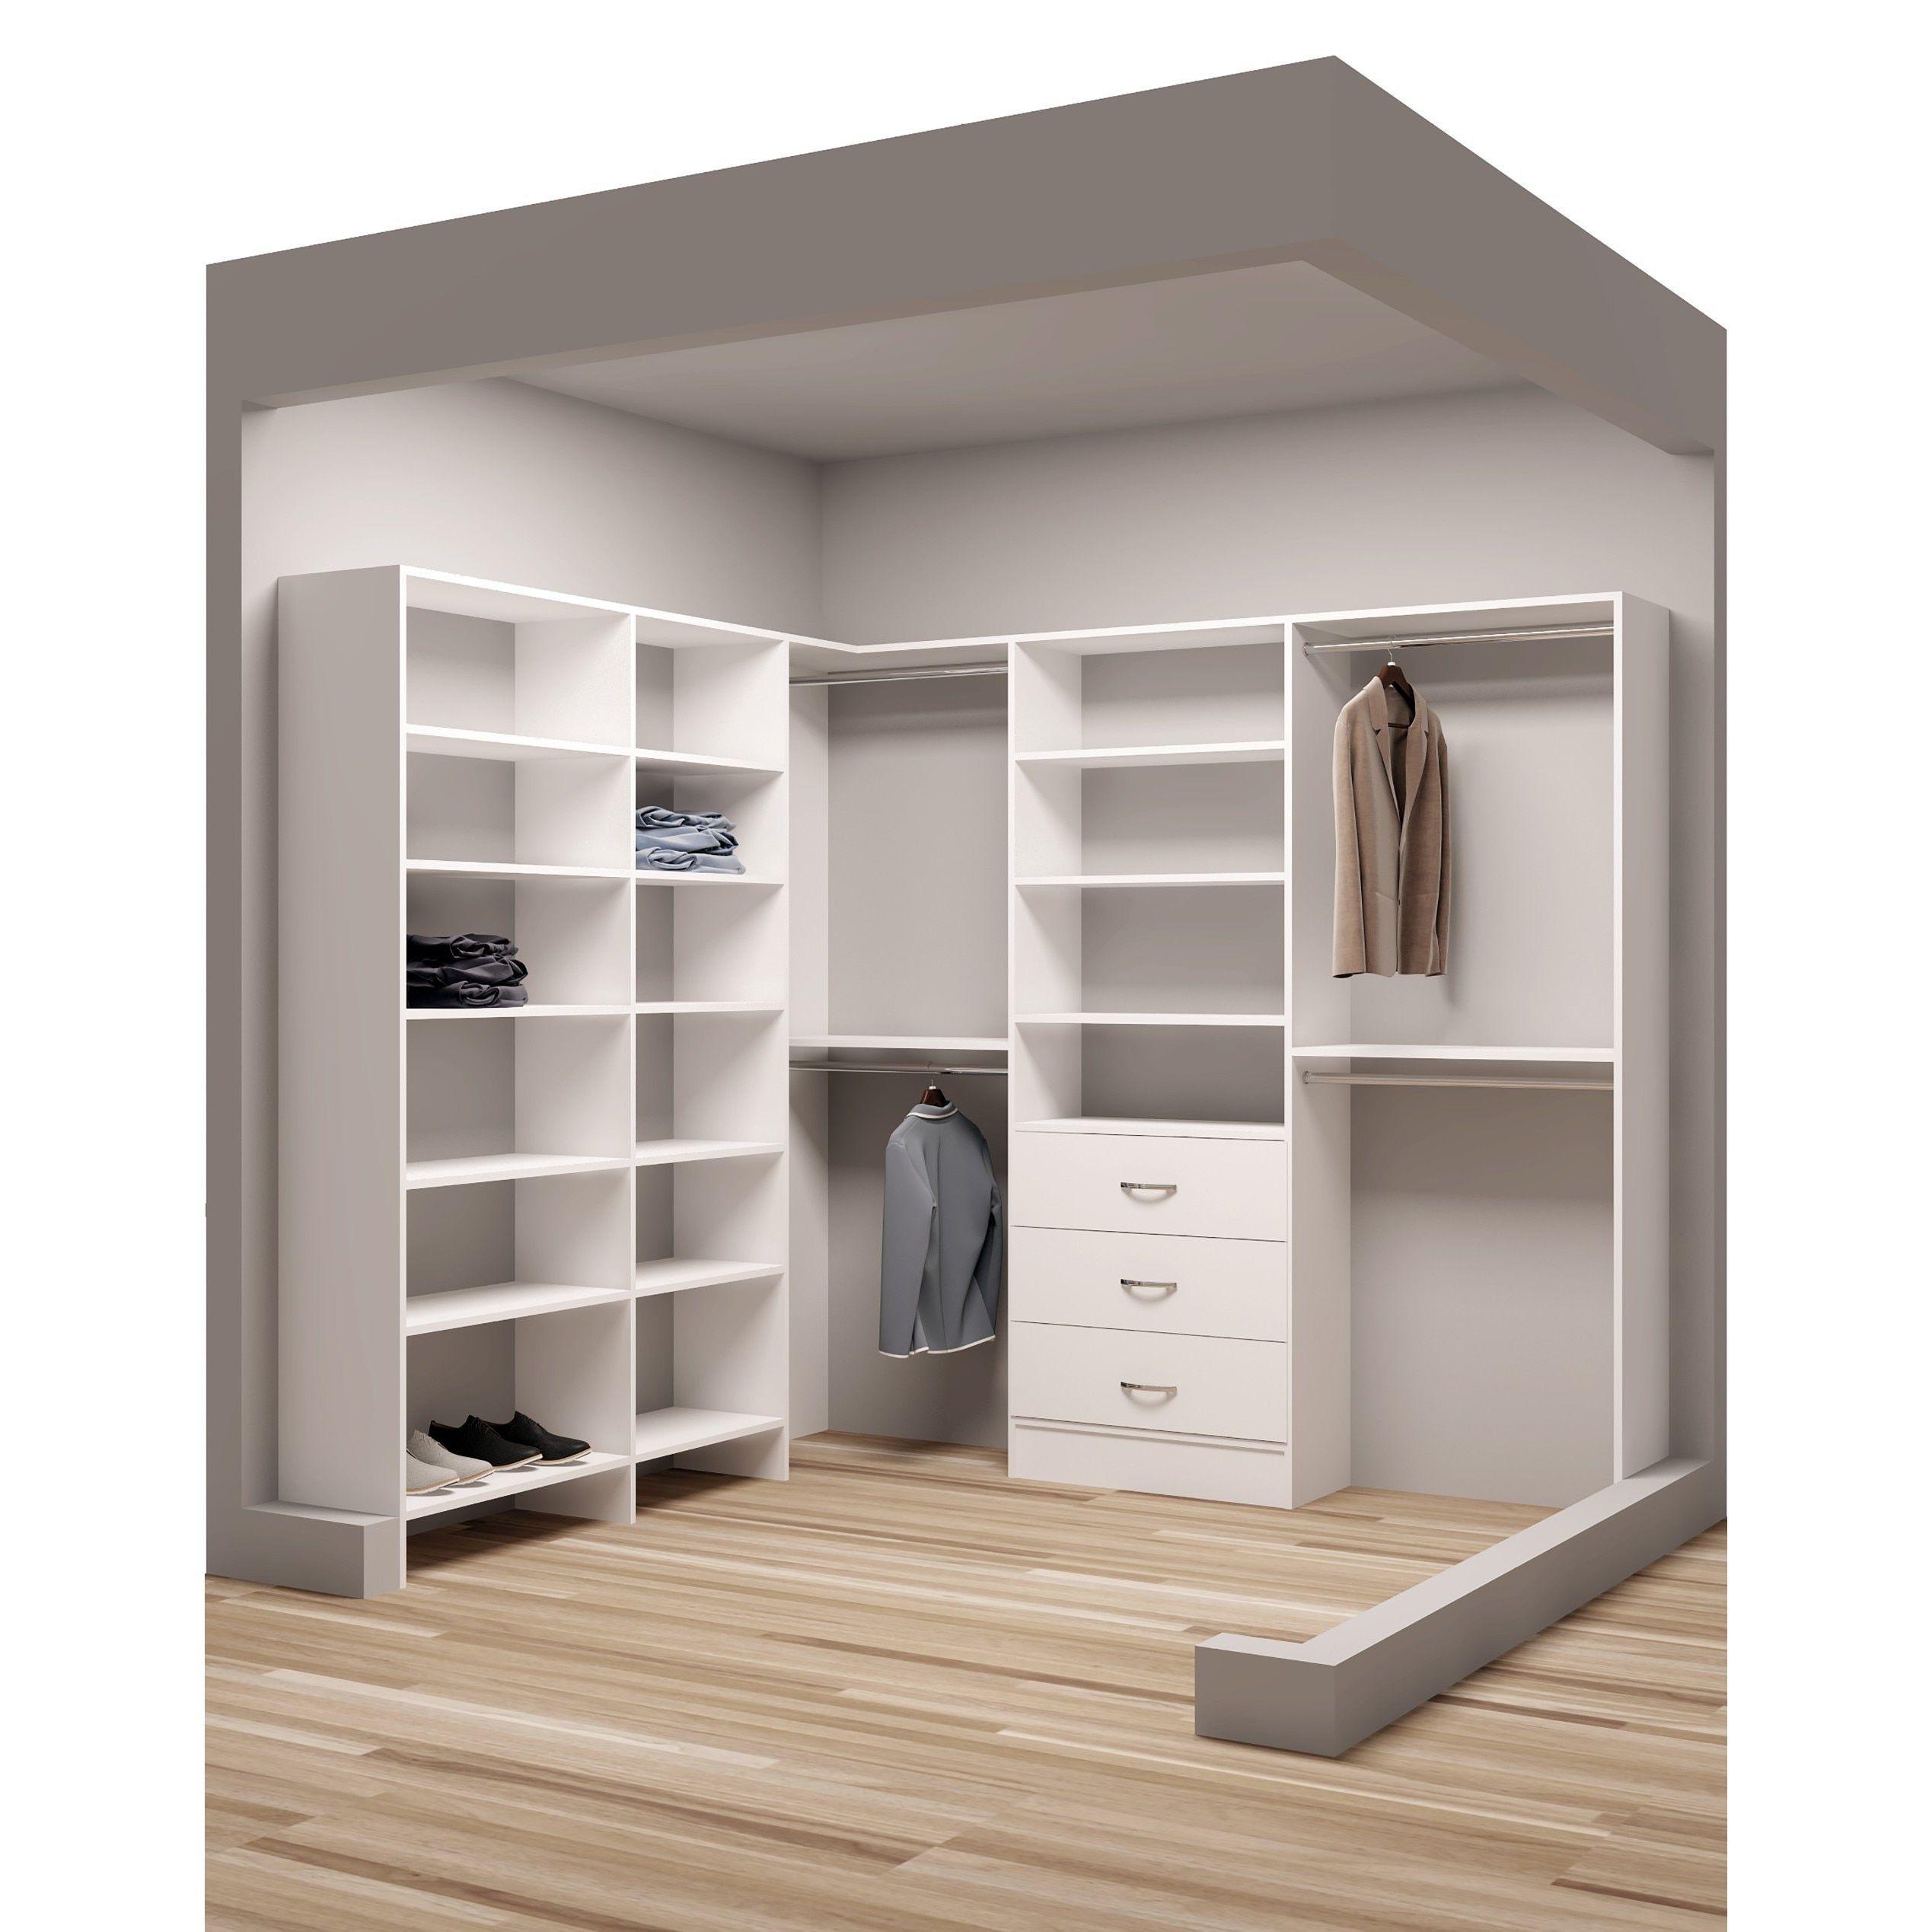 Tidysquares Classic White Wood 93 X 84 25 Corner Walk In Closet Organizer White Chrome Closet System Walkin Closets Organization Walk In Closet